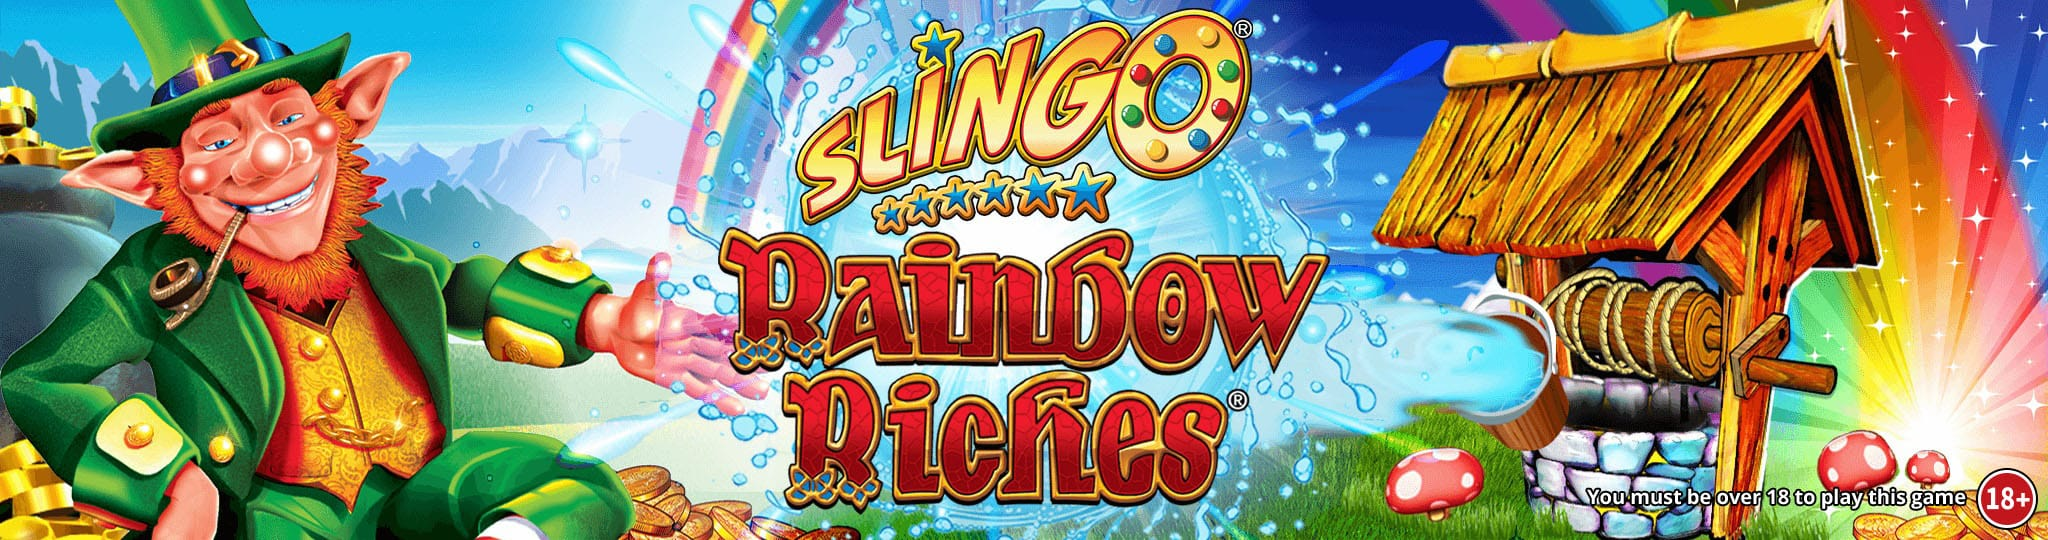 Slingo Rainbow Riches Slots Racer